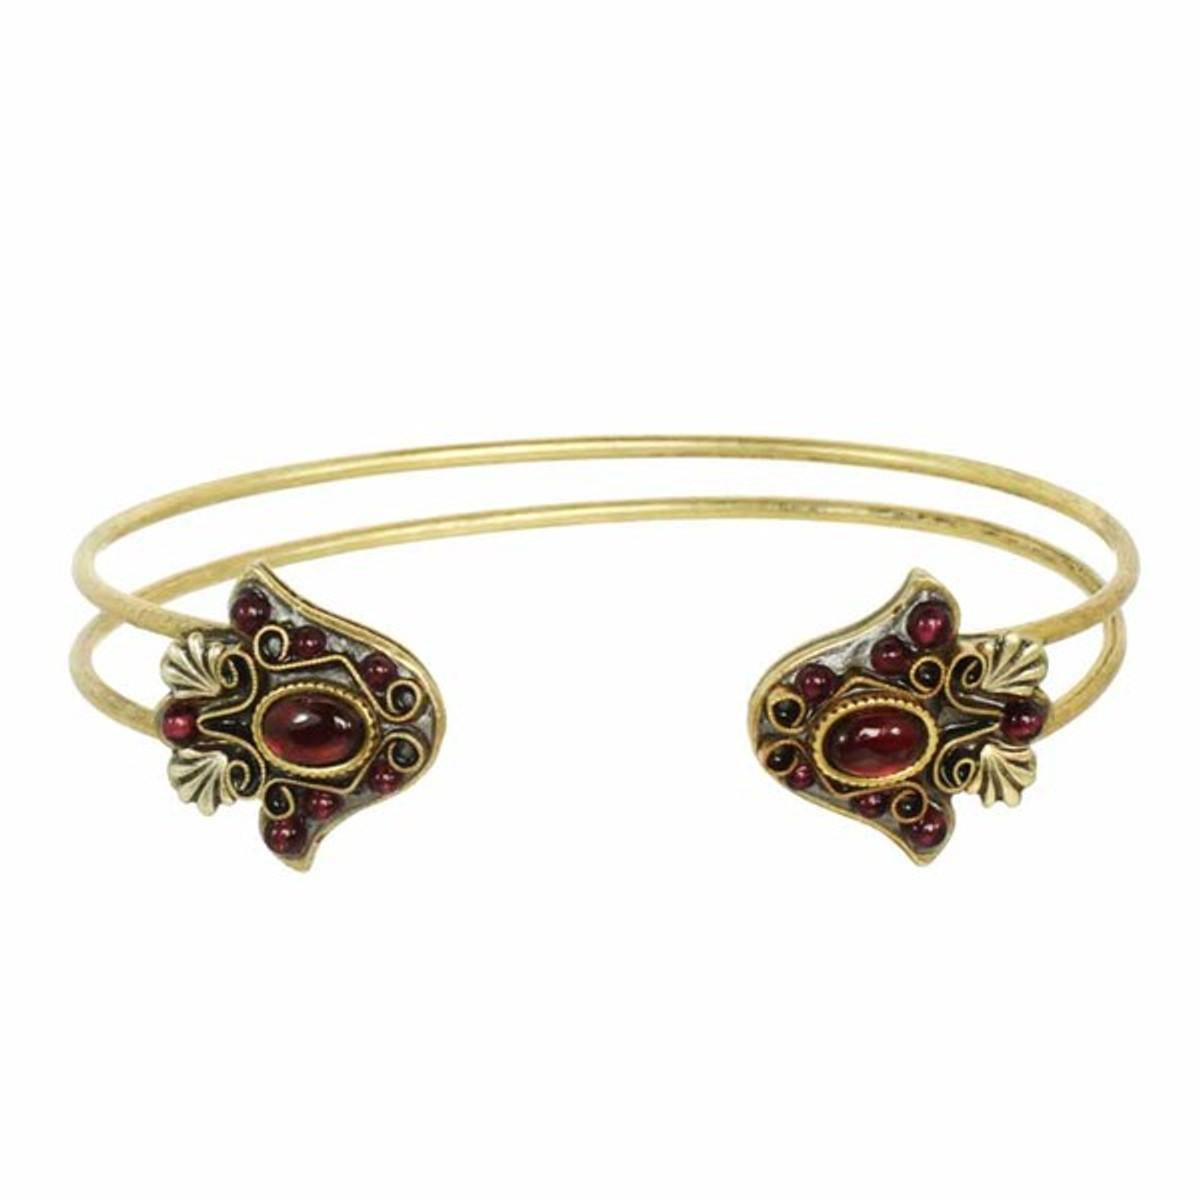 Hamsa bracelet from Michal Golan Jewellery